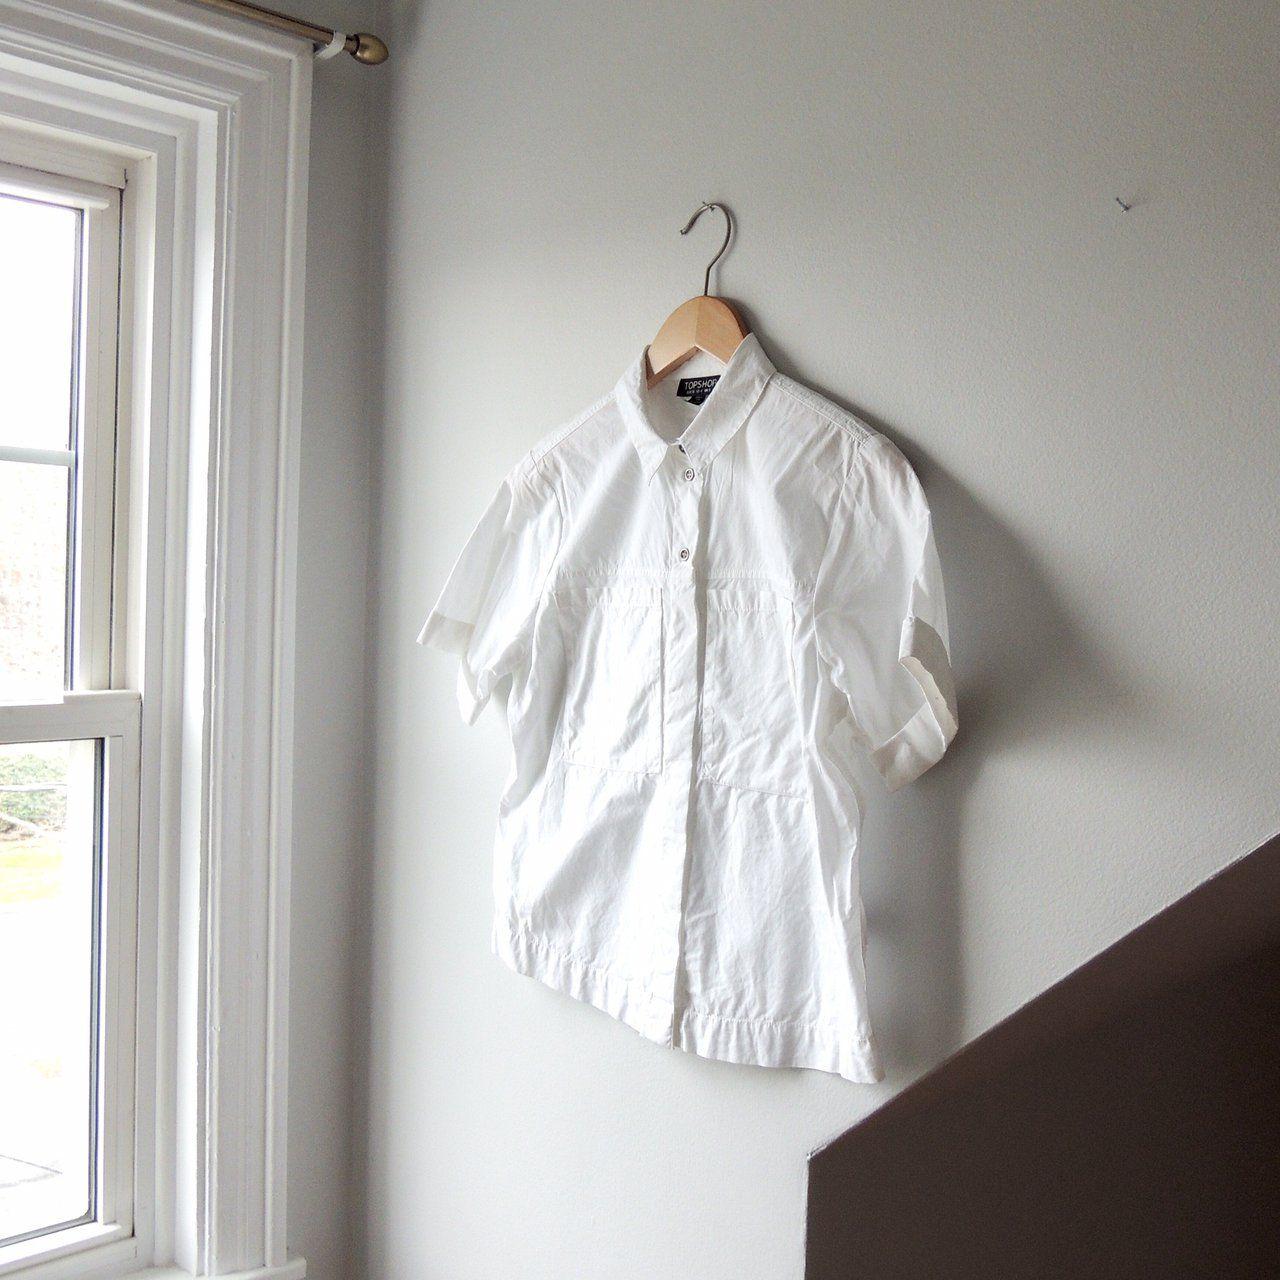 4934f2bb1f0 @lisaloveslions on Depop Top Shop white button-down short sleeve cotton  shirt Size US 4 / UK 8 Classic white cotton button-down with cuffed sleeves  Top 3 ...